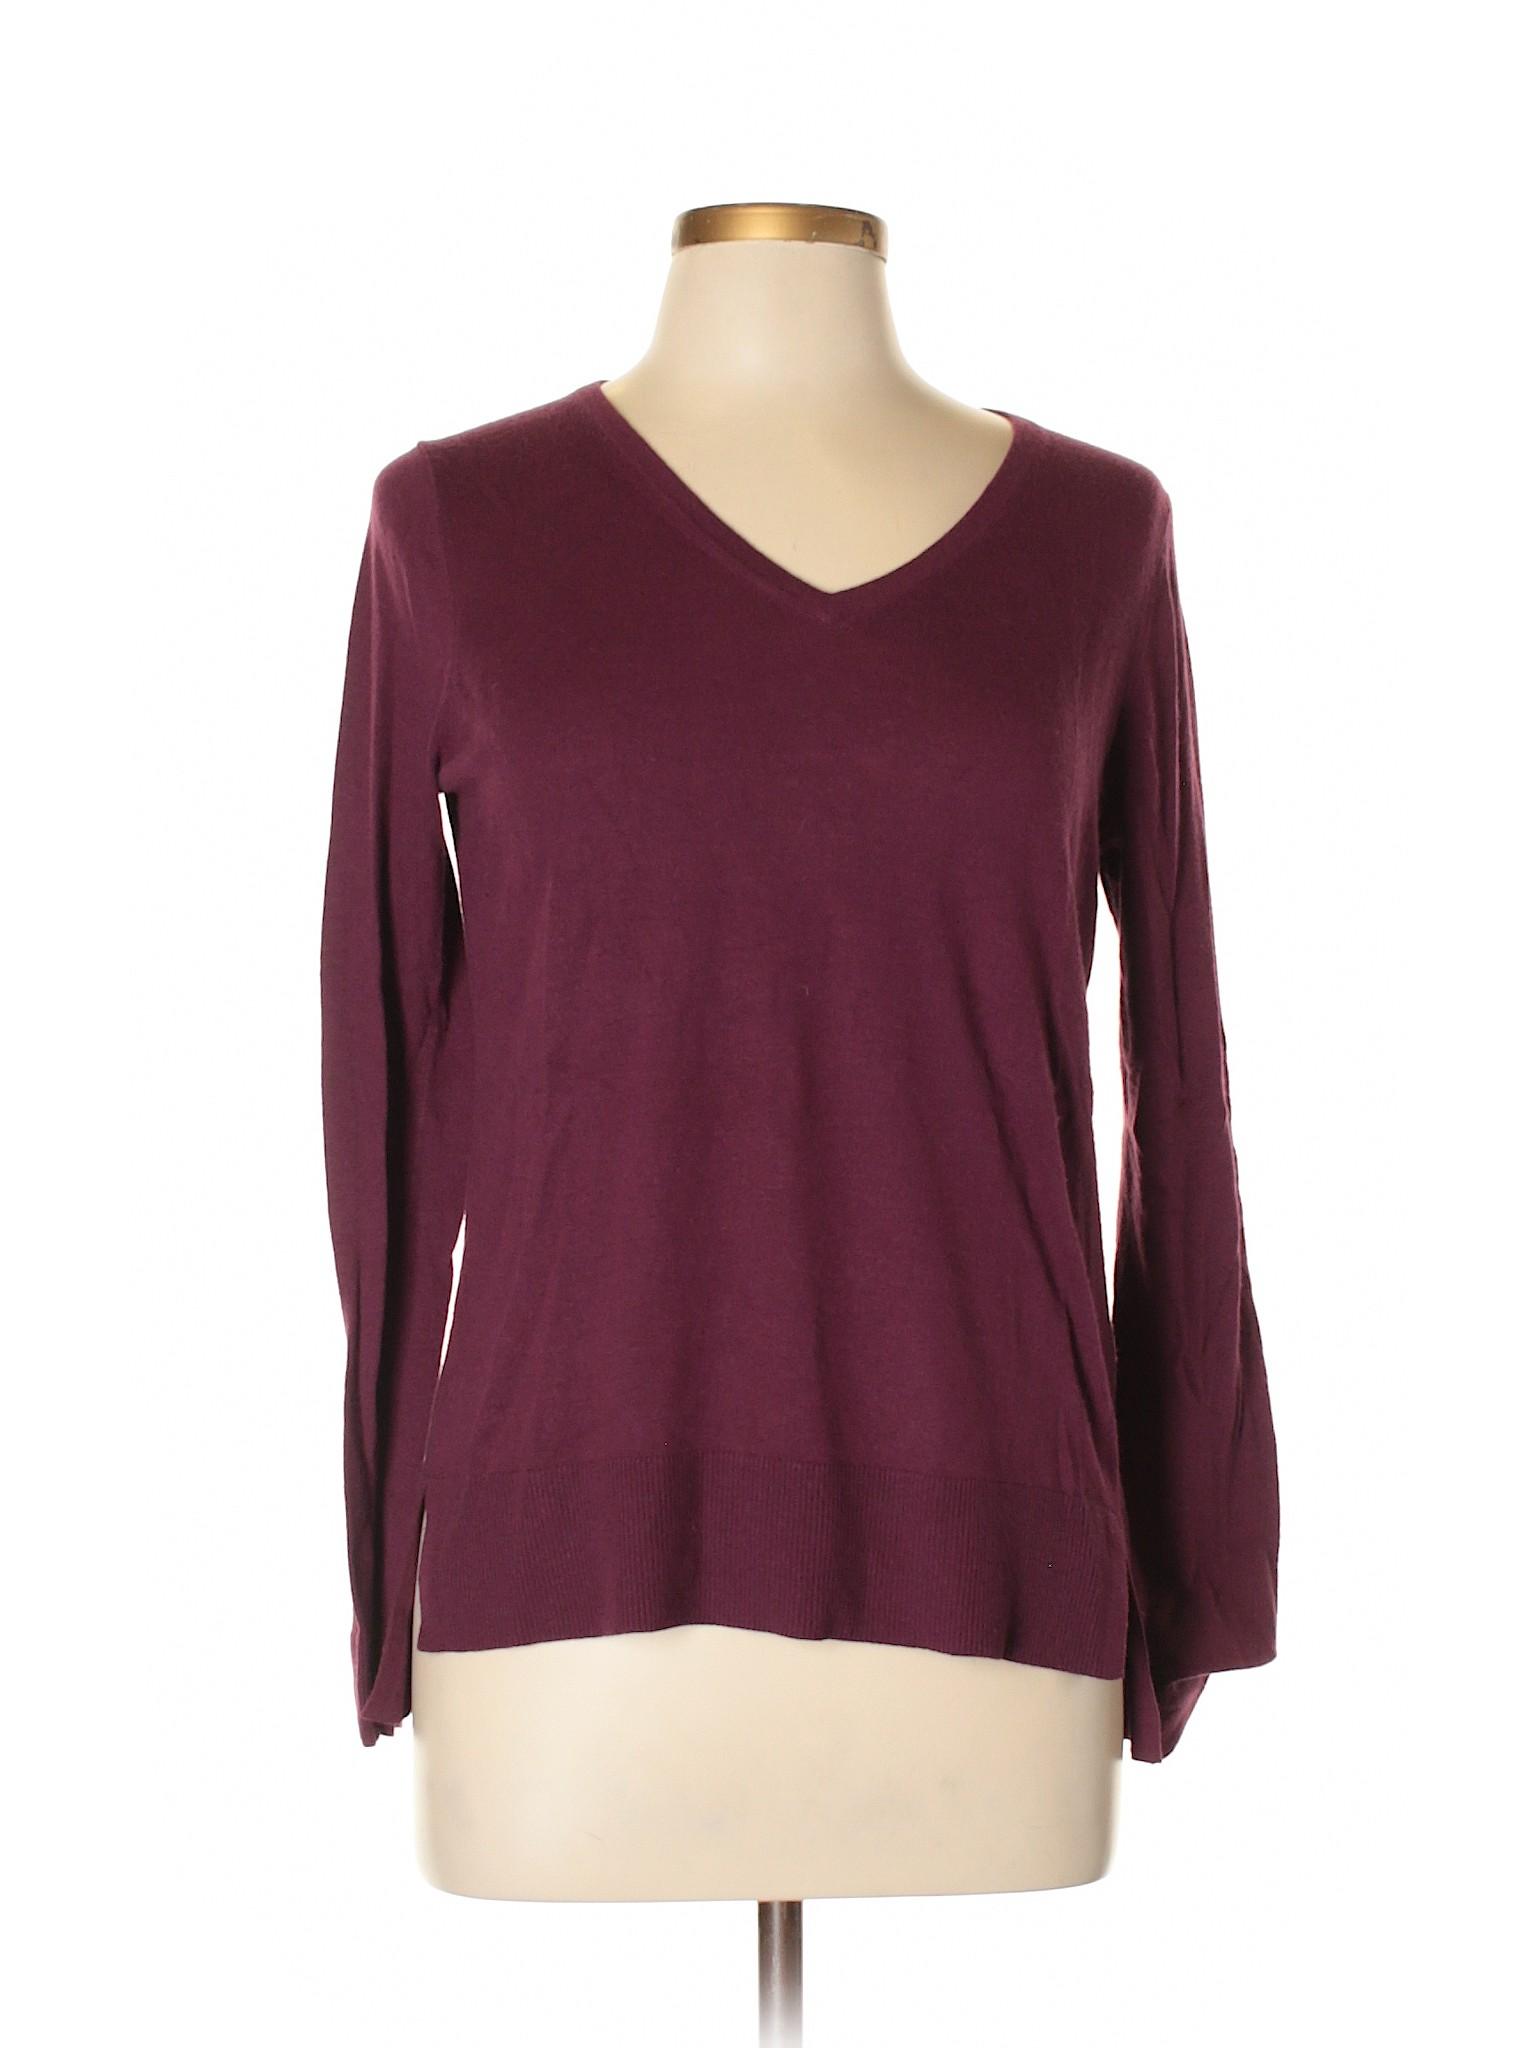 Boutique Sweater Pullover Taylor LOFT Ann ZvU60Z